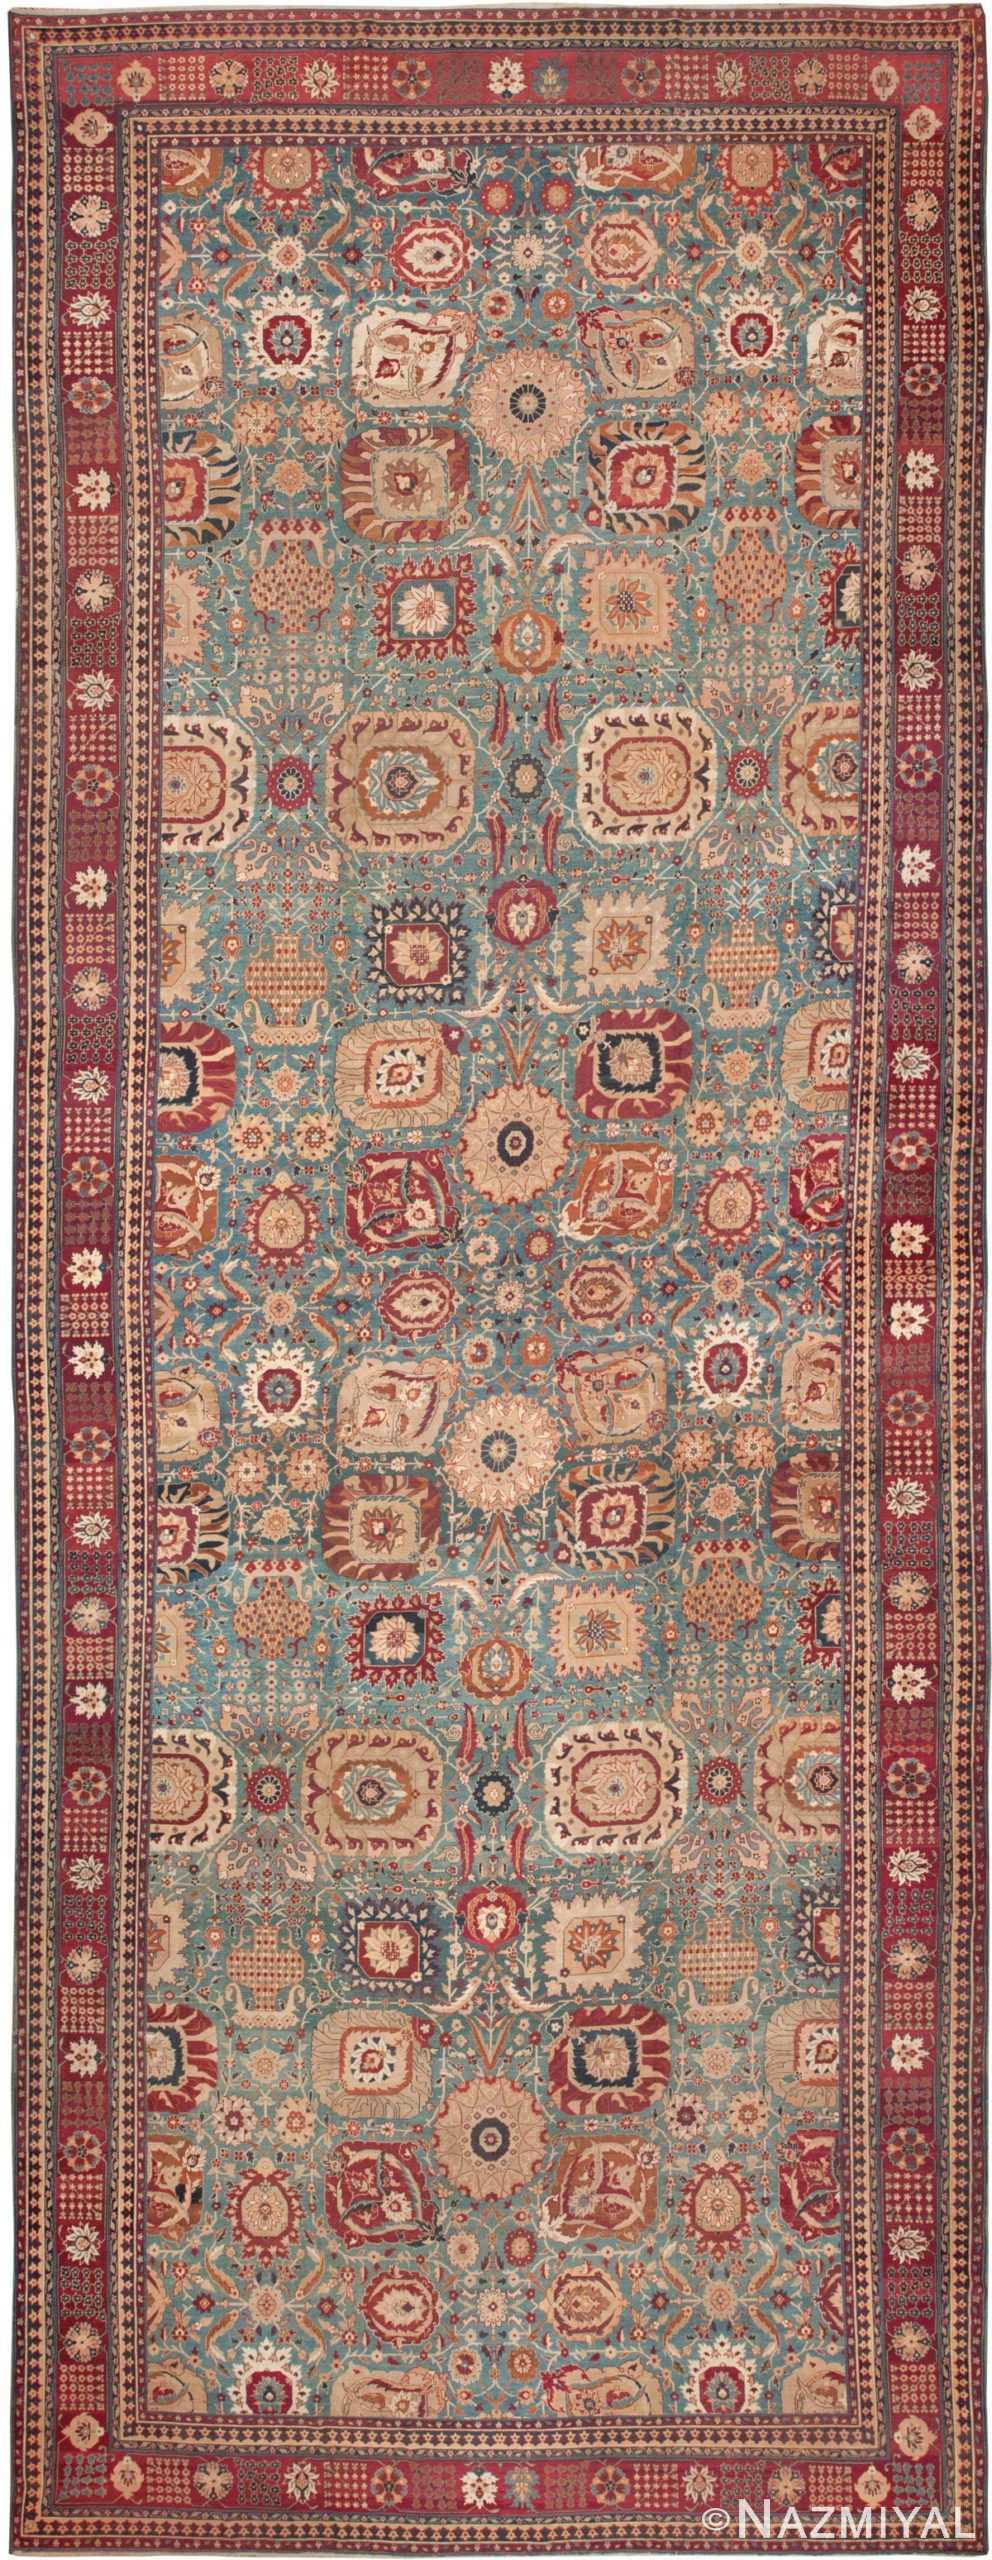 large antique vase design indian agra rug 3342 Nazmiyal